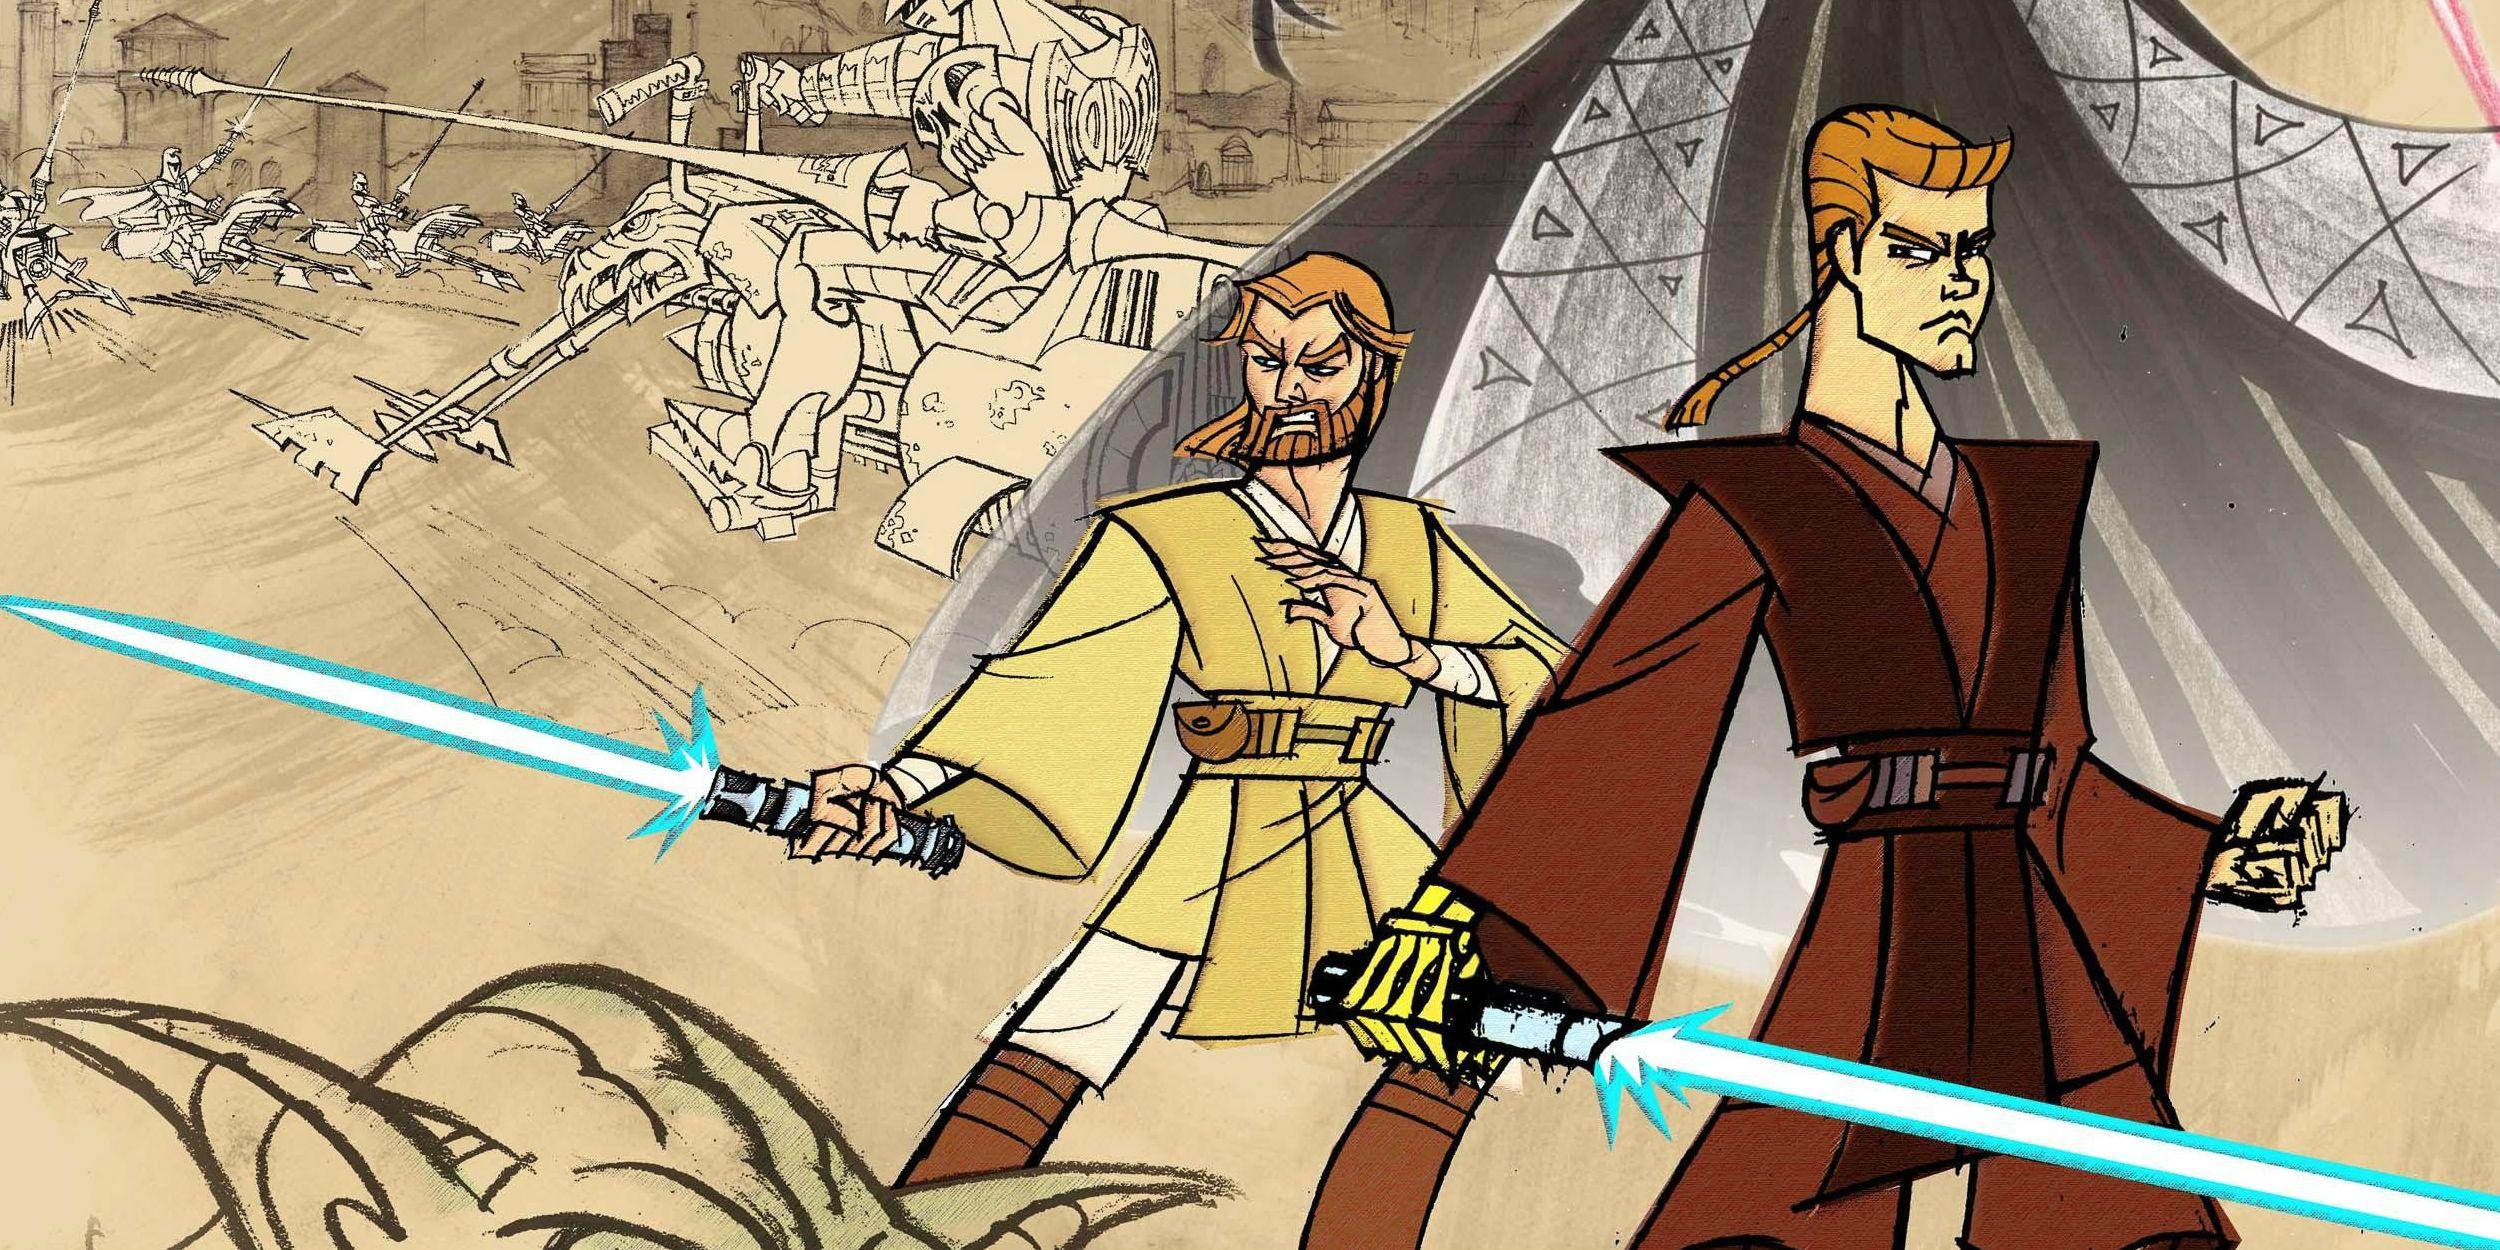 Why Genndy Tartakovsky's Star Wars: Clone Wars Isn't Canon